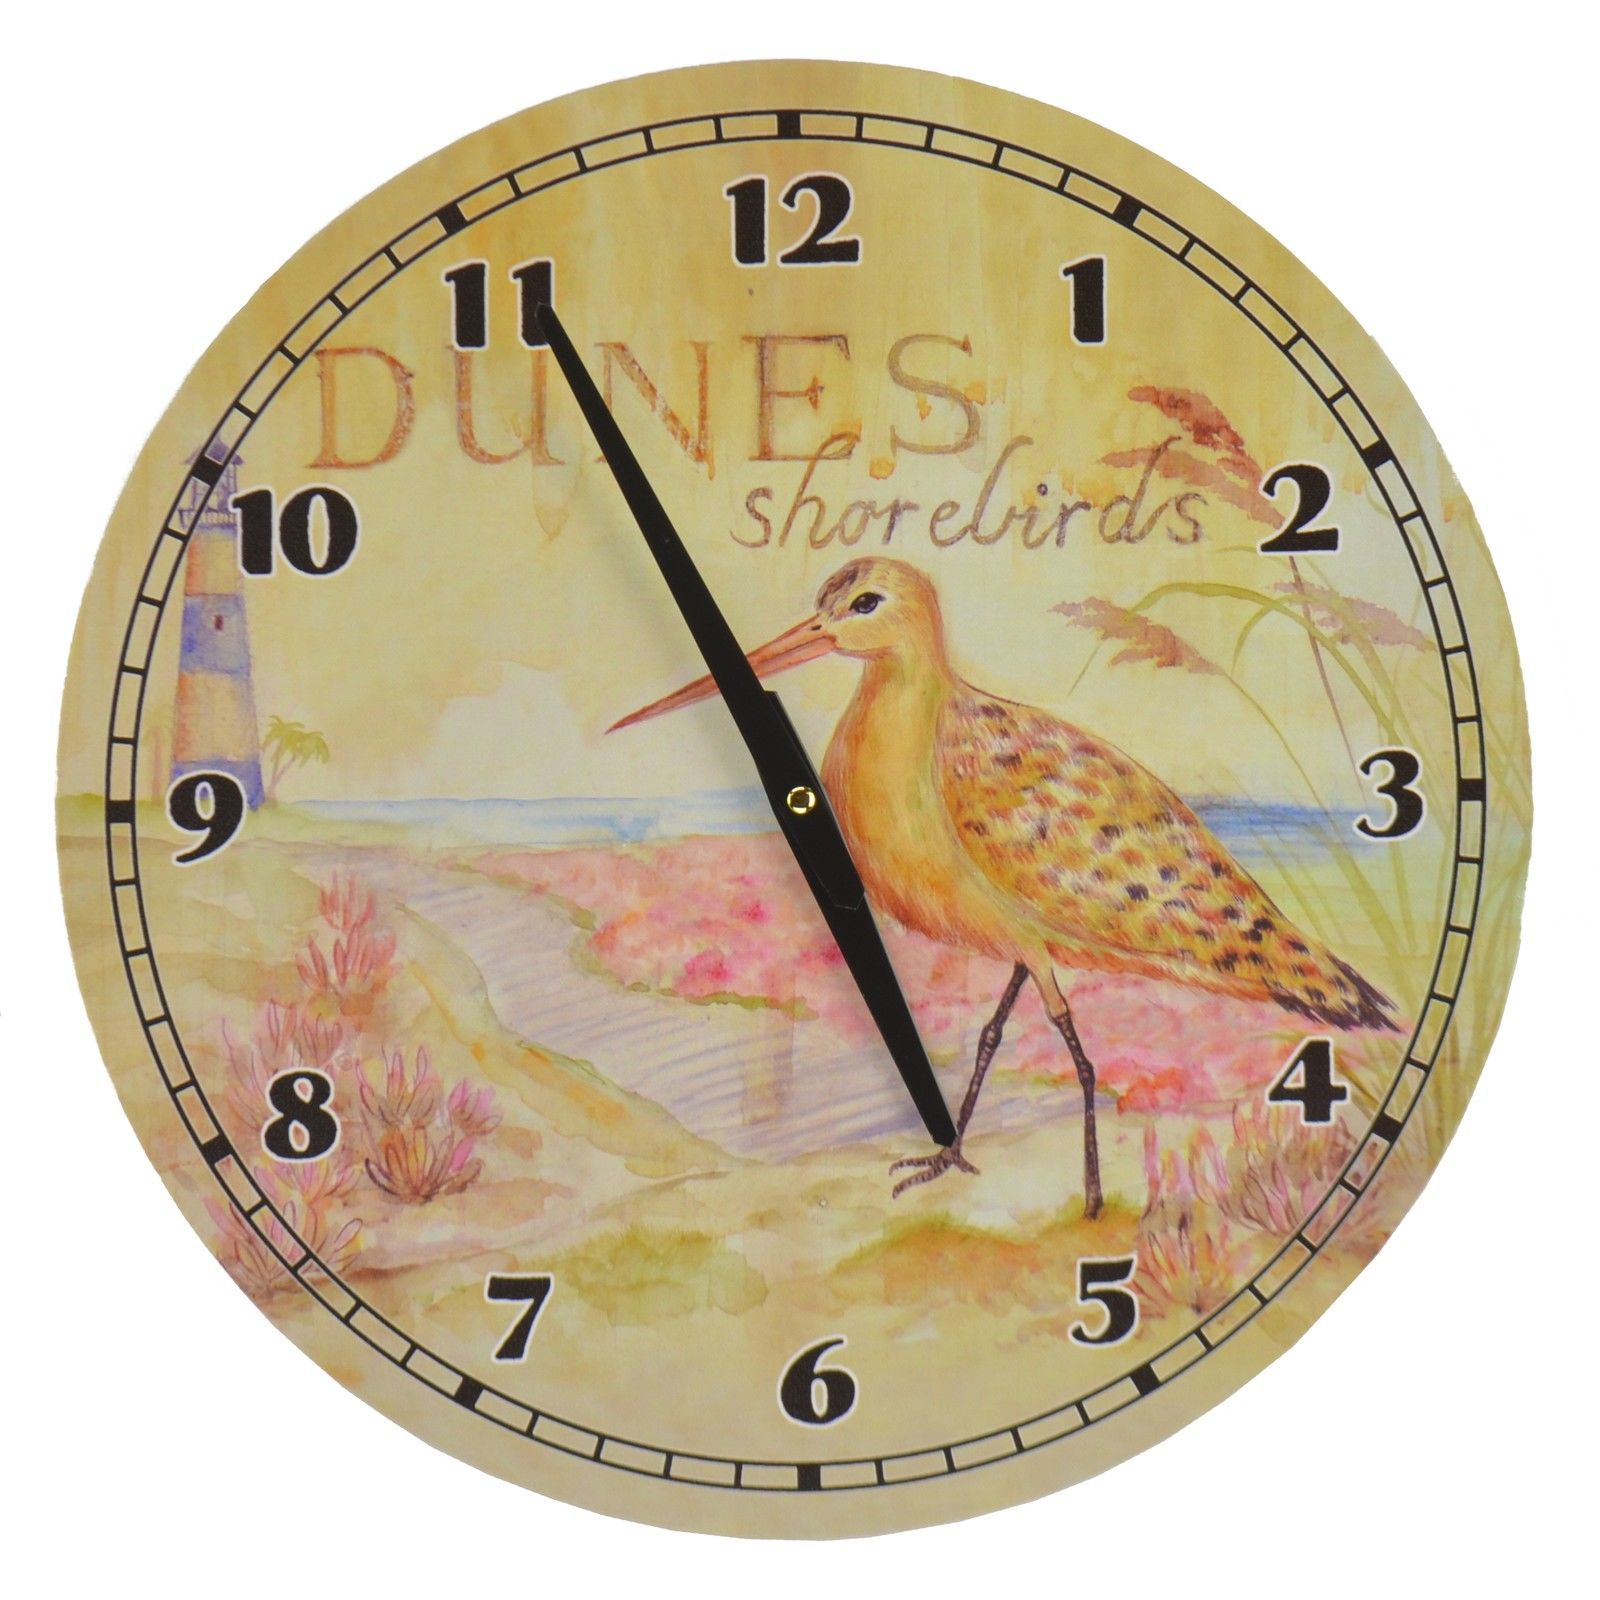 Lighthouse Clock: 2 listings